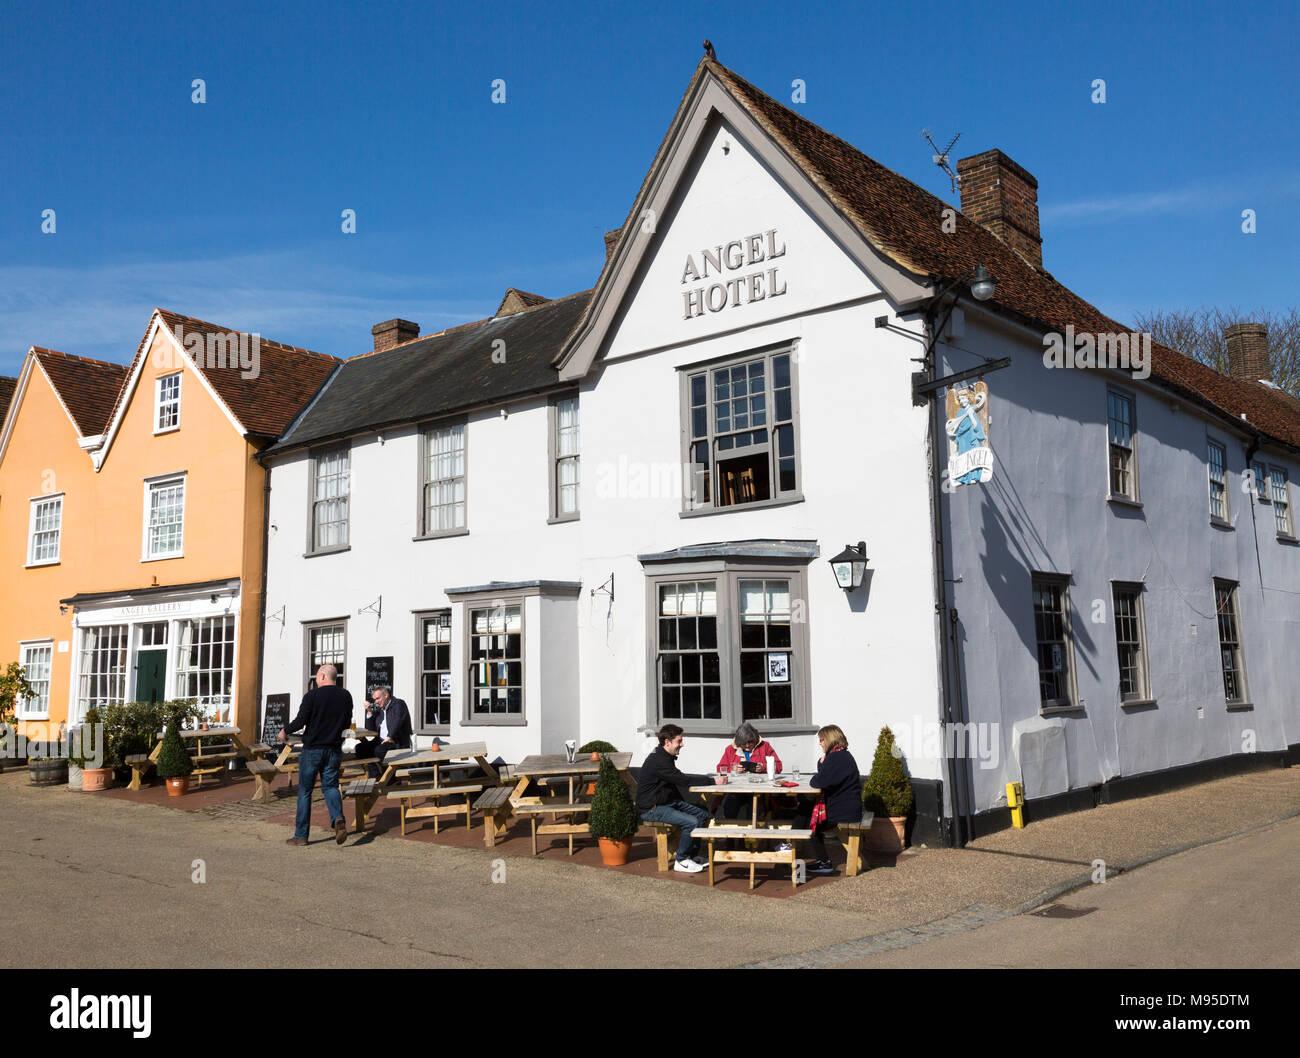 Historic architecture of the Angel Hotel, Lavenham, Suffolk, England, UK - Stock Image